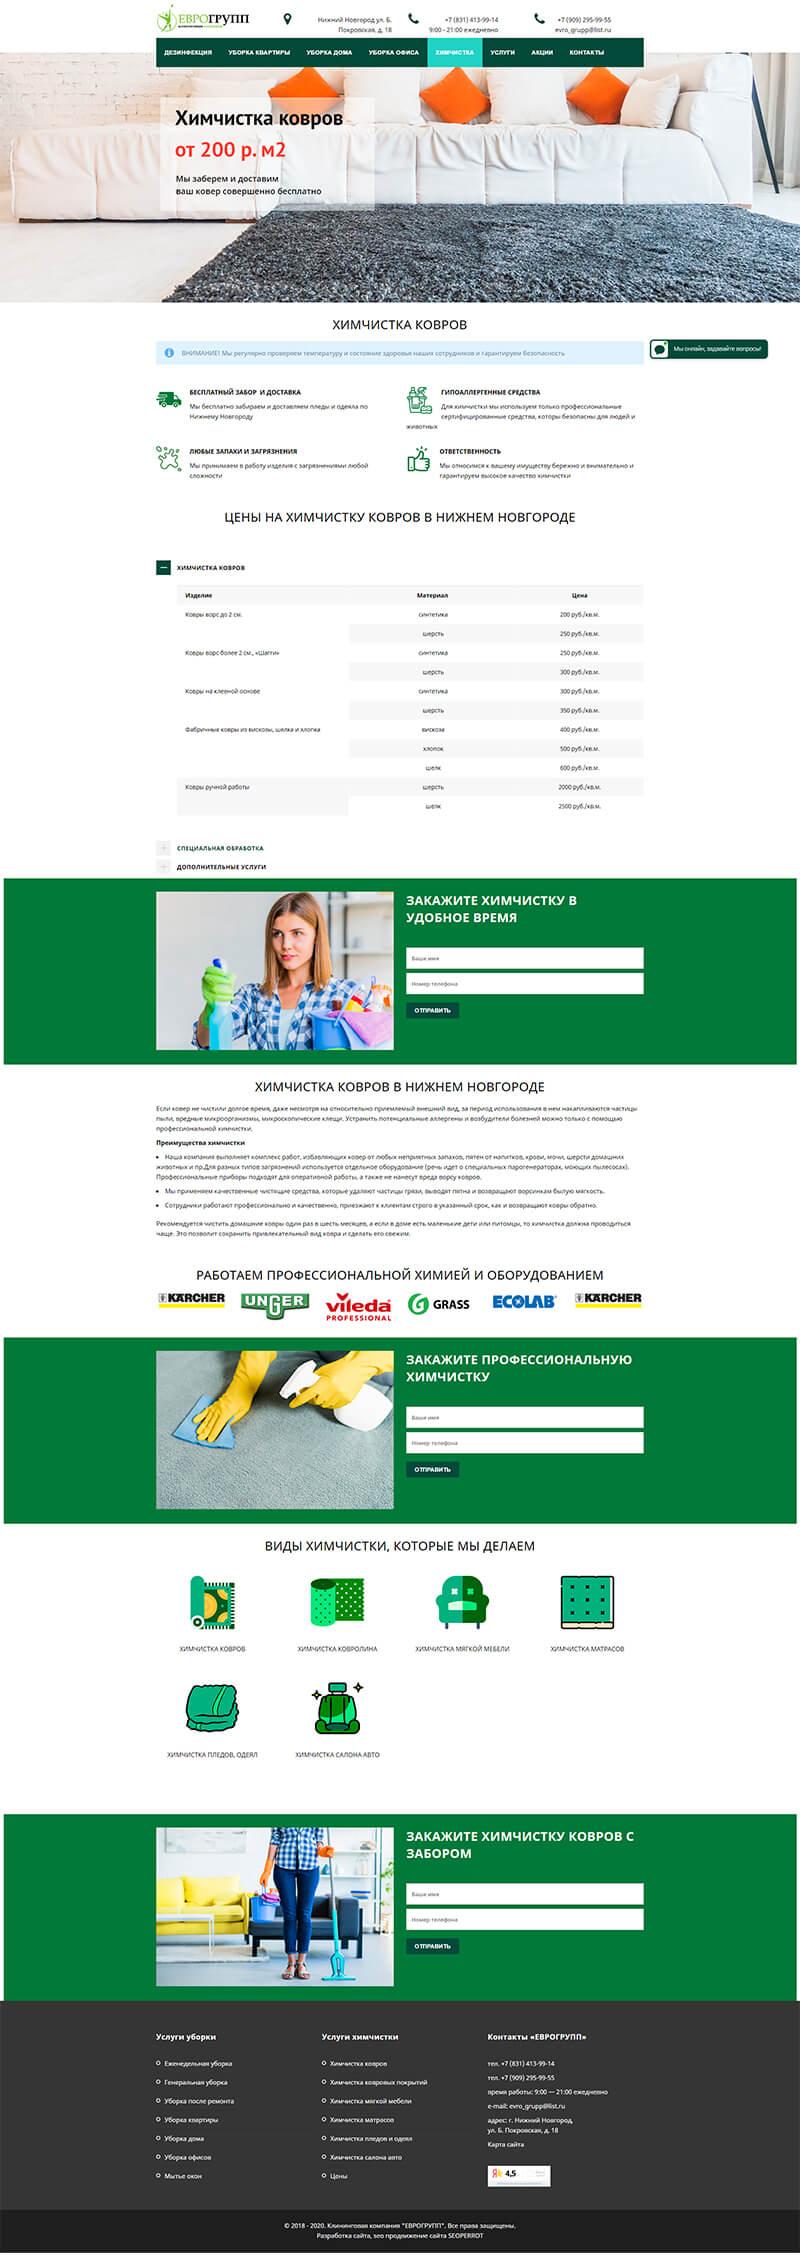 Страница сайта услуги клининга